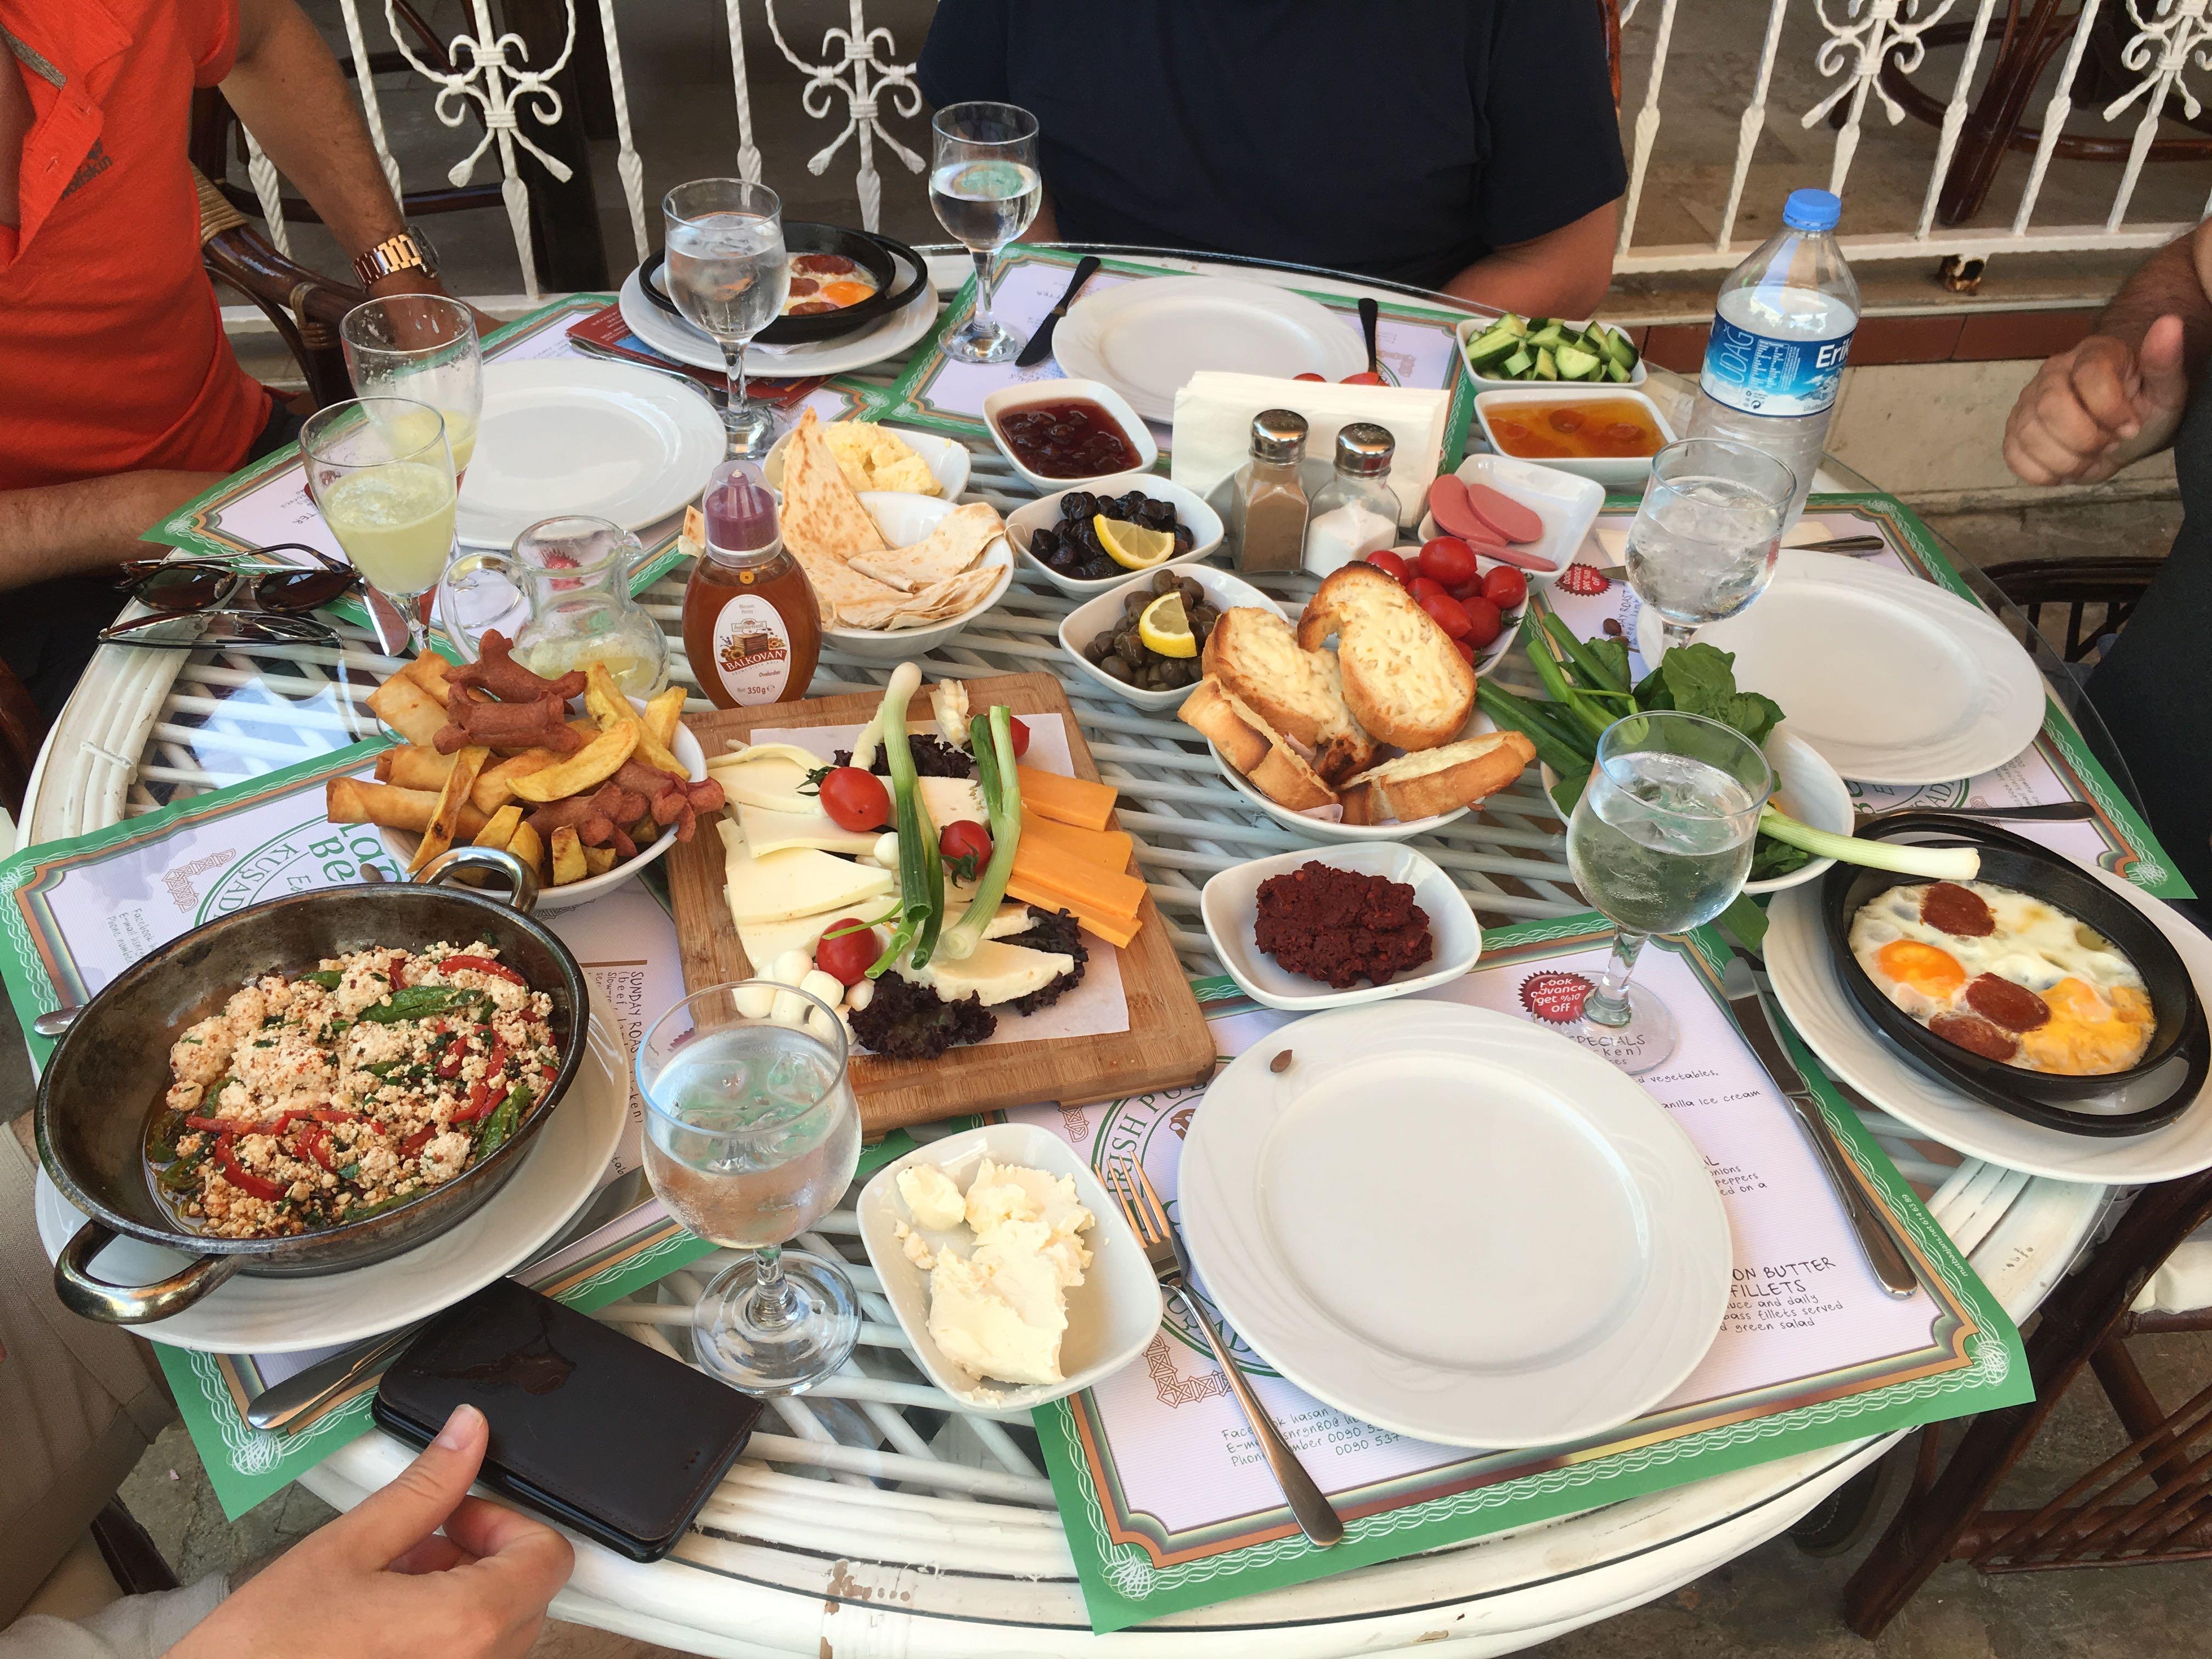 Uitgebreid Turks ontbijt